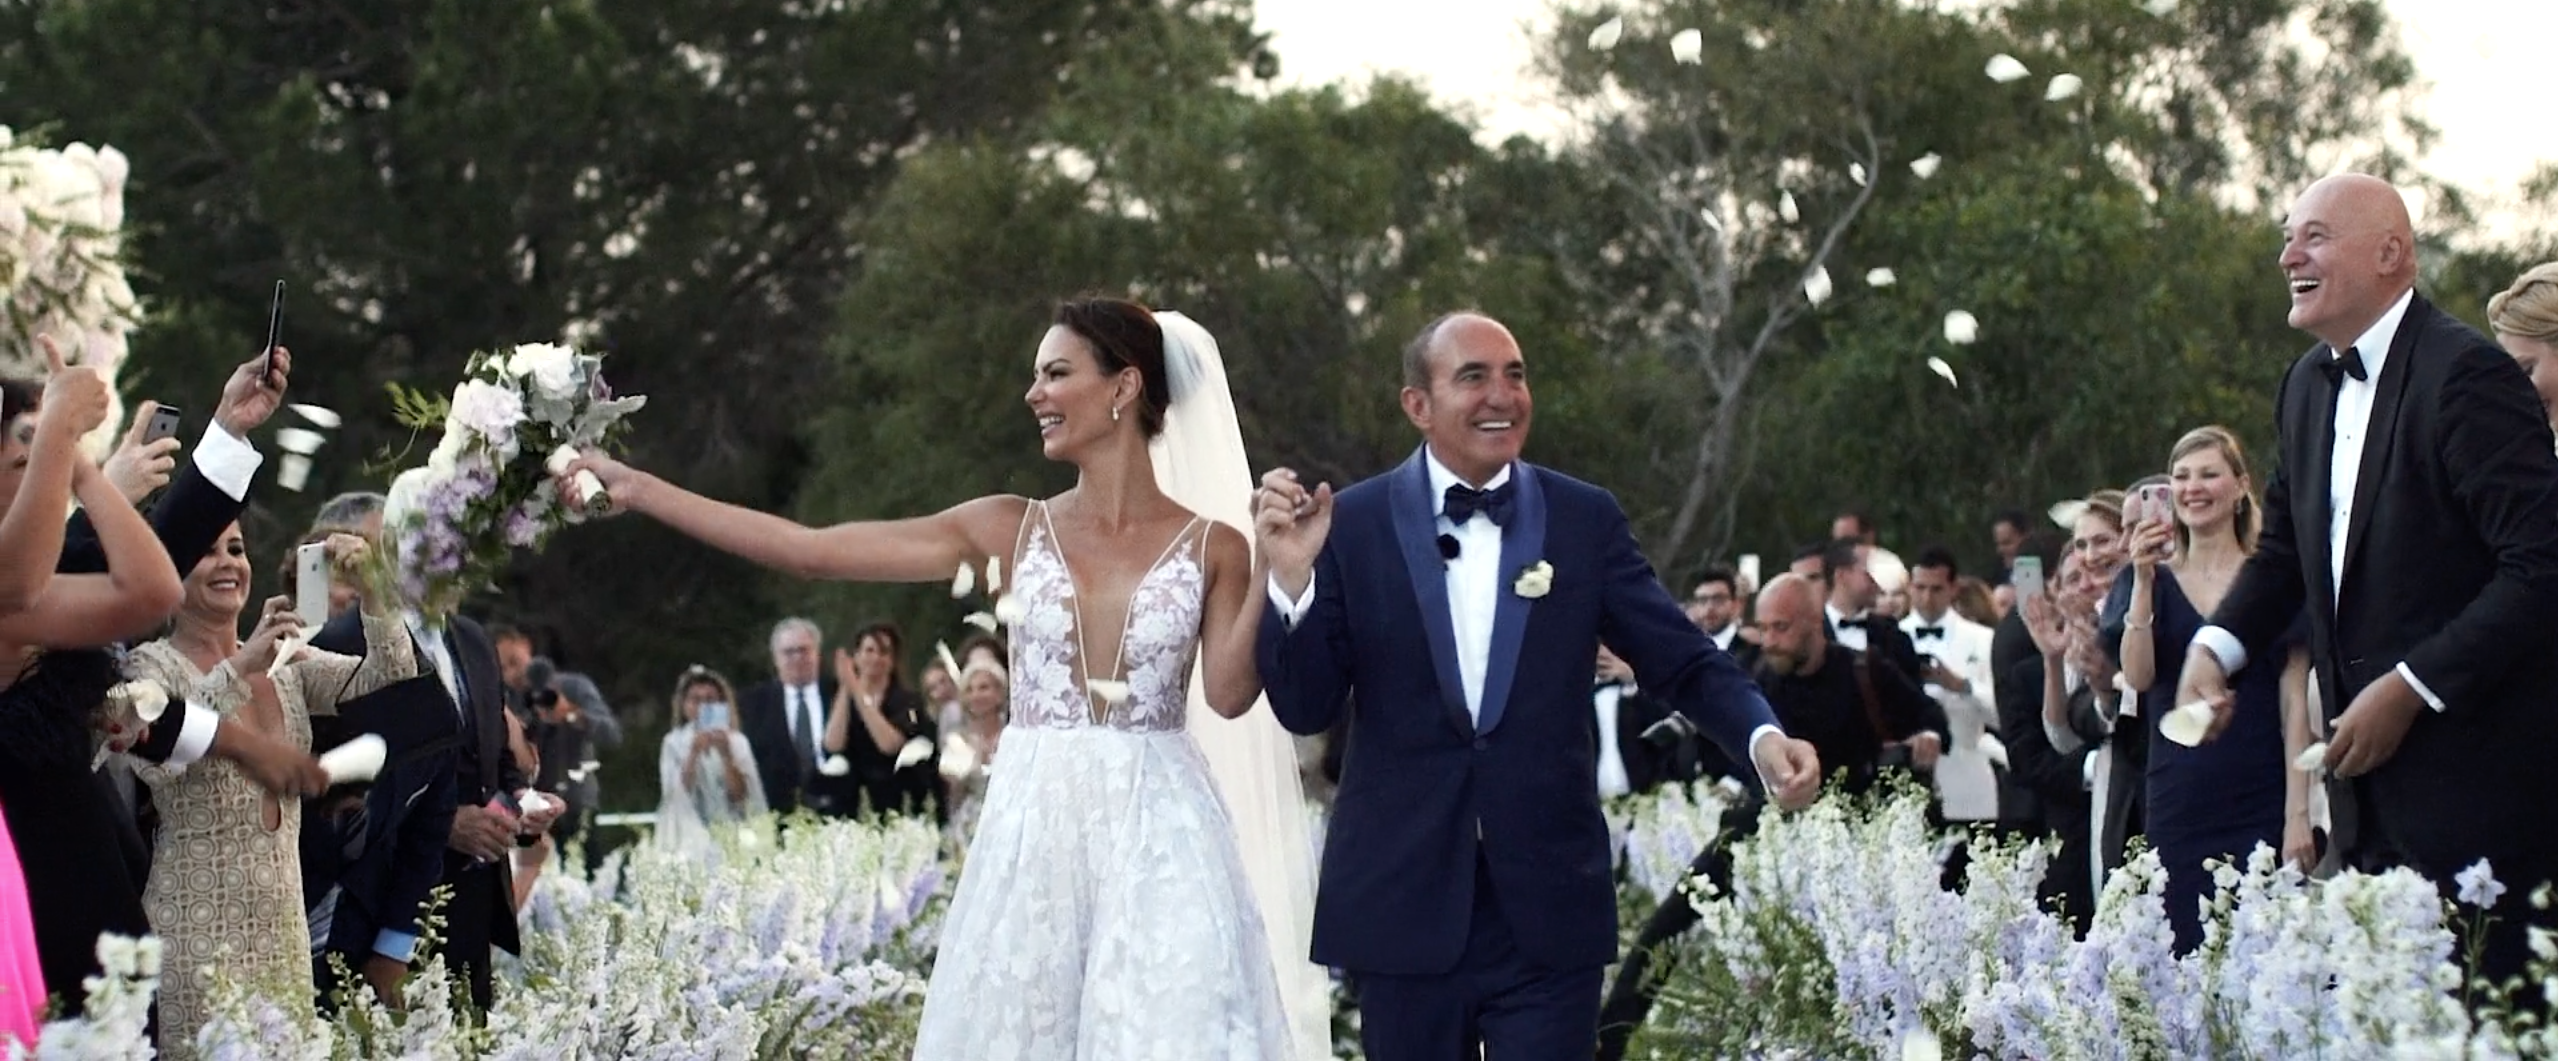 Elegant luxury wedding in Sardine, Italy / Luciane & Jay